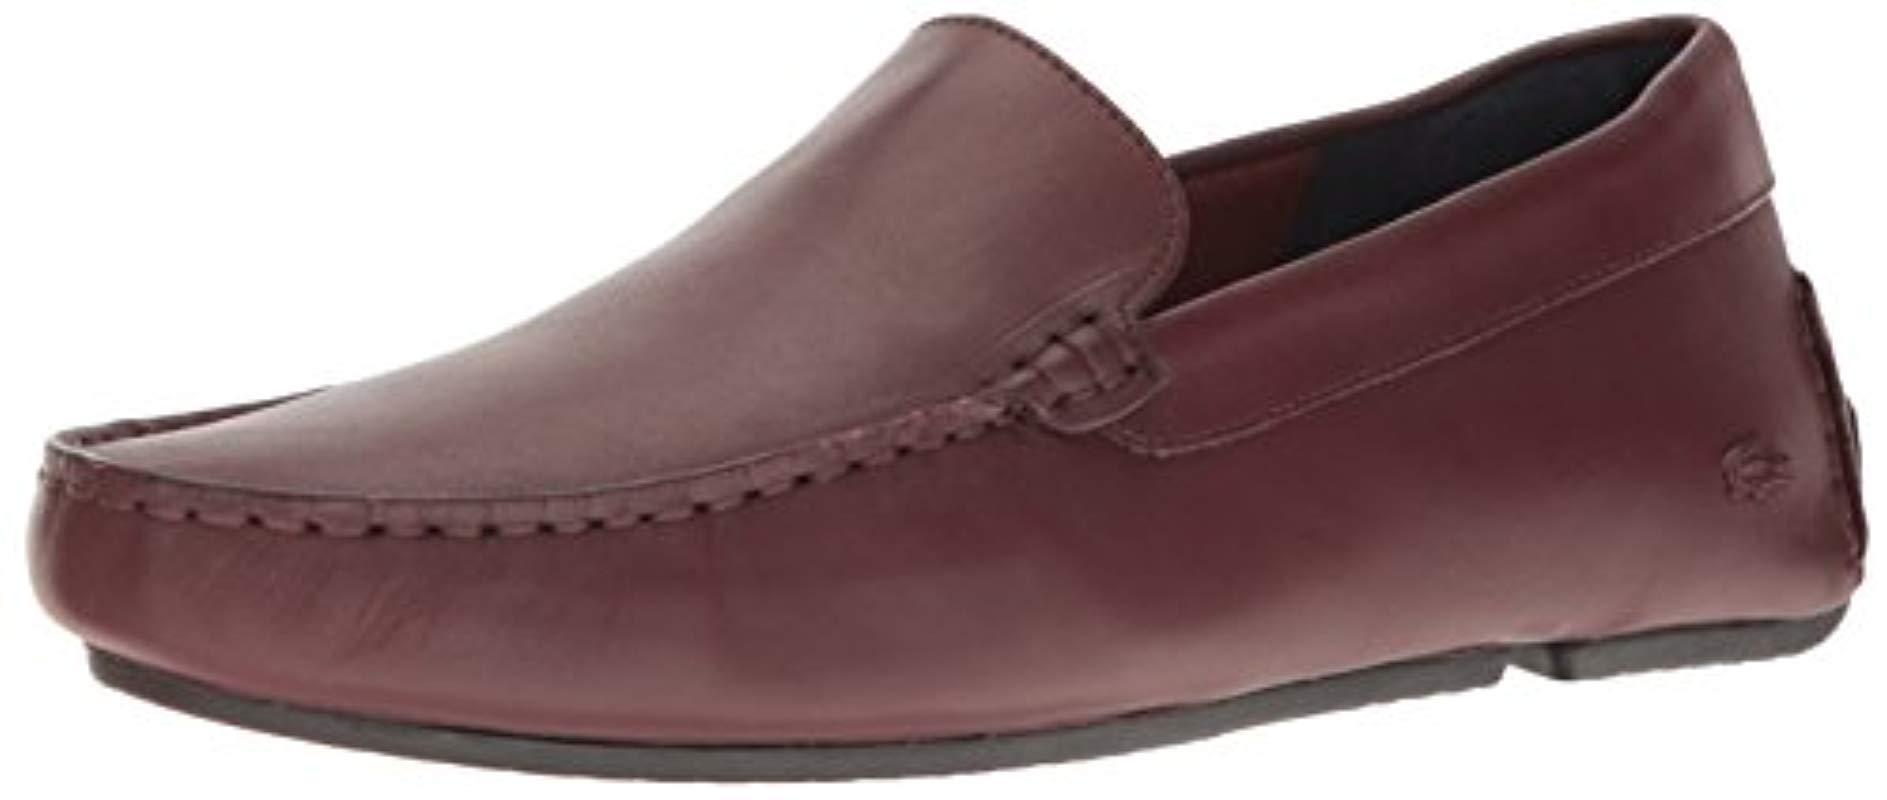 00795f813c3412 Lyst - Lacoste Piloter 117 1 Formal Shoe Fashion Sneaker in Brown ...